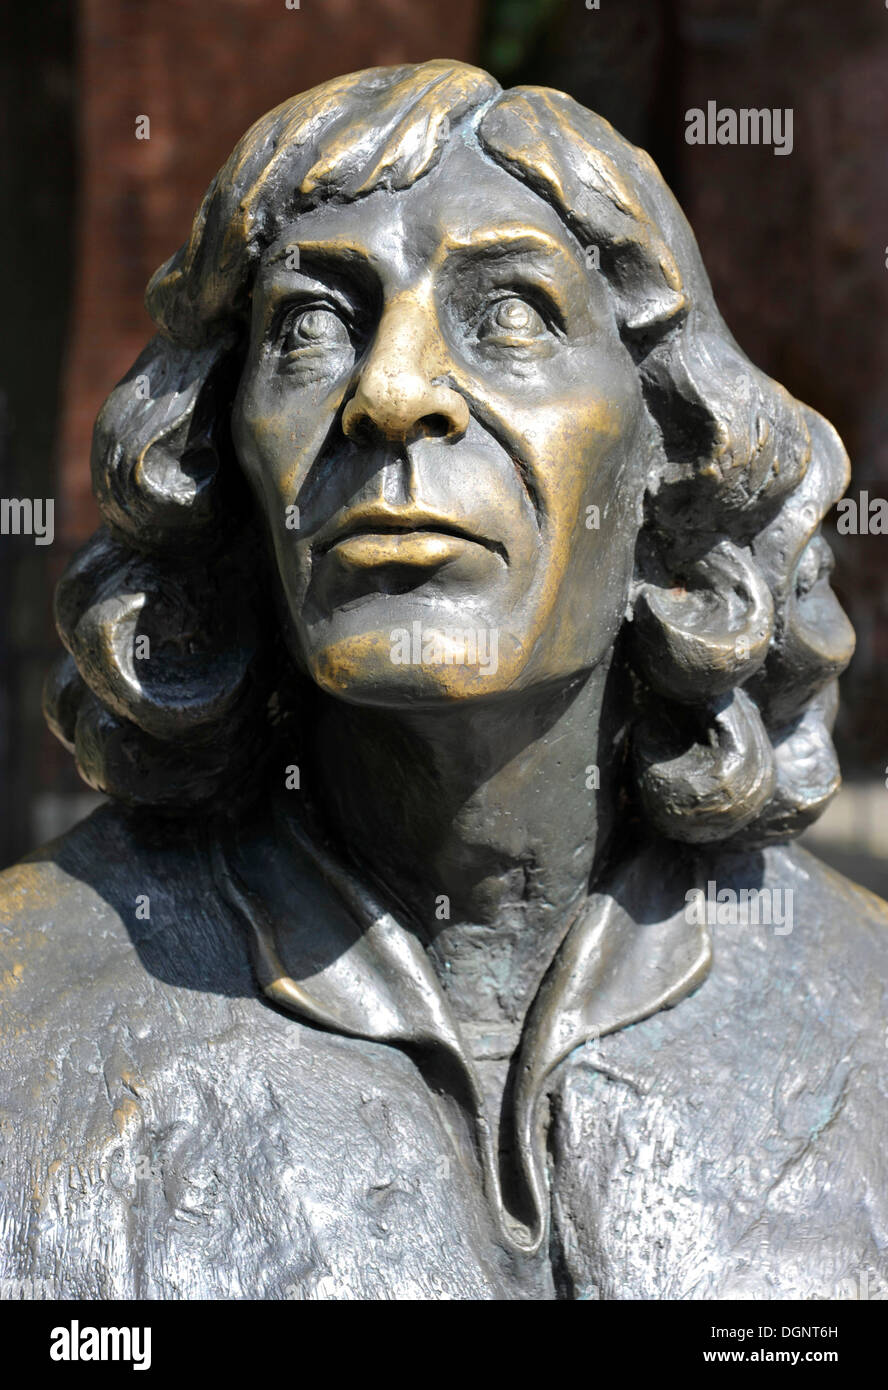 Nicholas Copernicus Monument, Castle Museum of Bishop's Castle, Allenstein, Olsztyn, Mazury, Poland, Europe - Stock Image